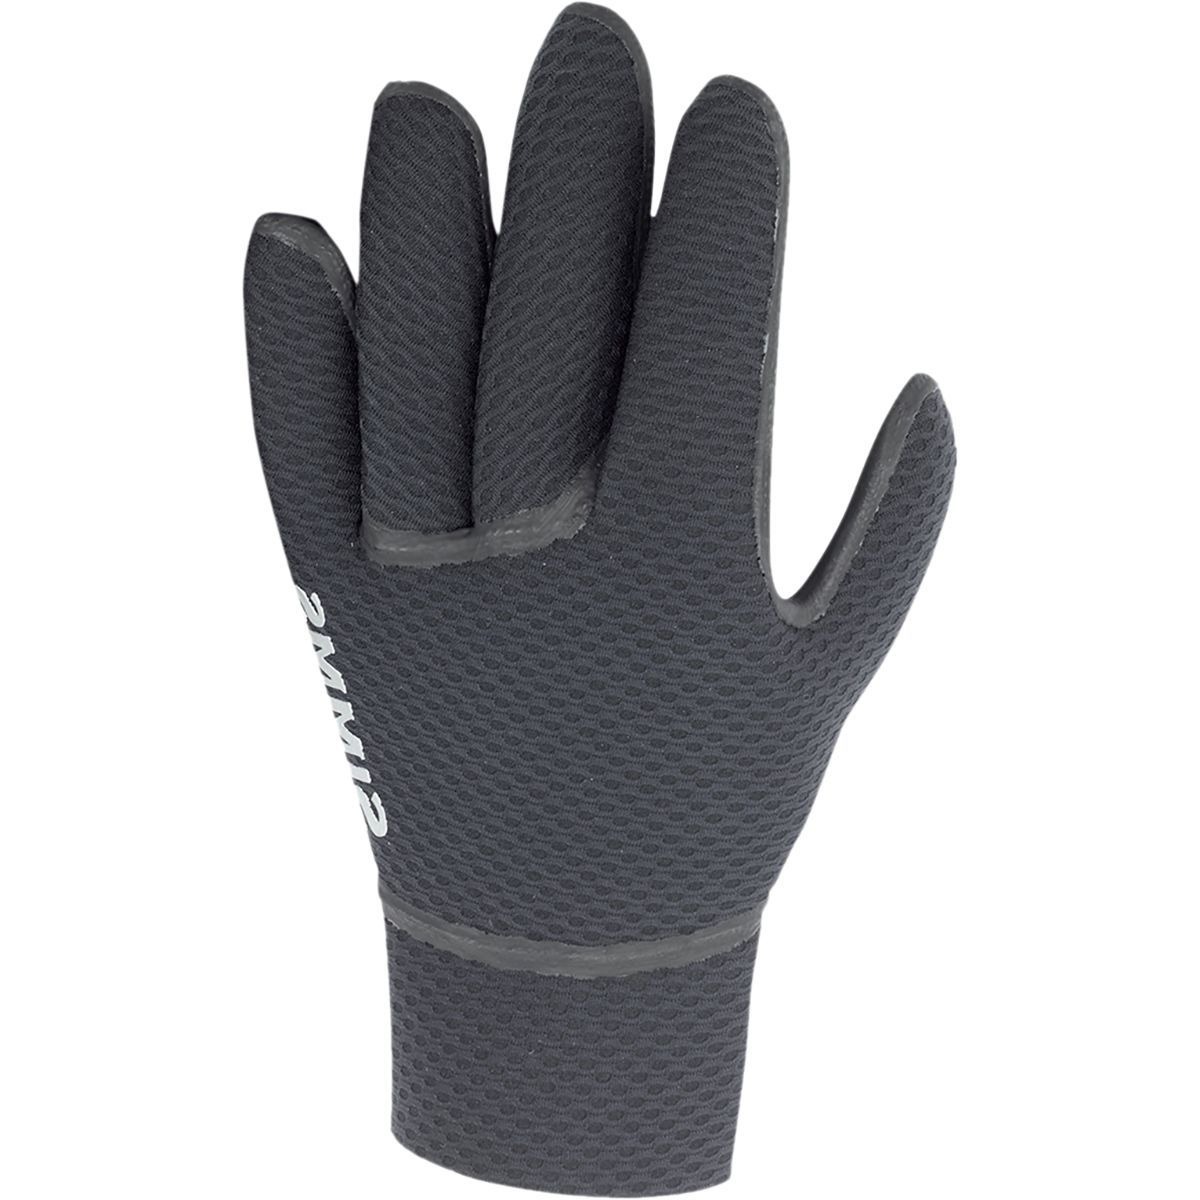 Simms Kispiox Glove - Men's